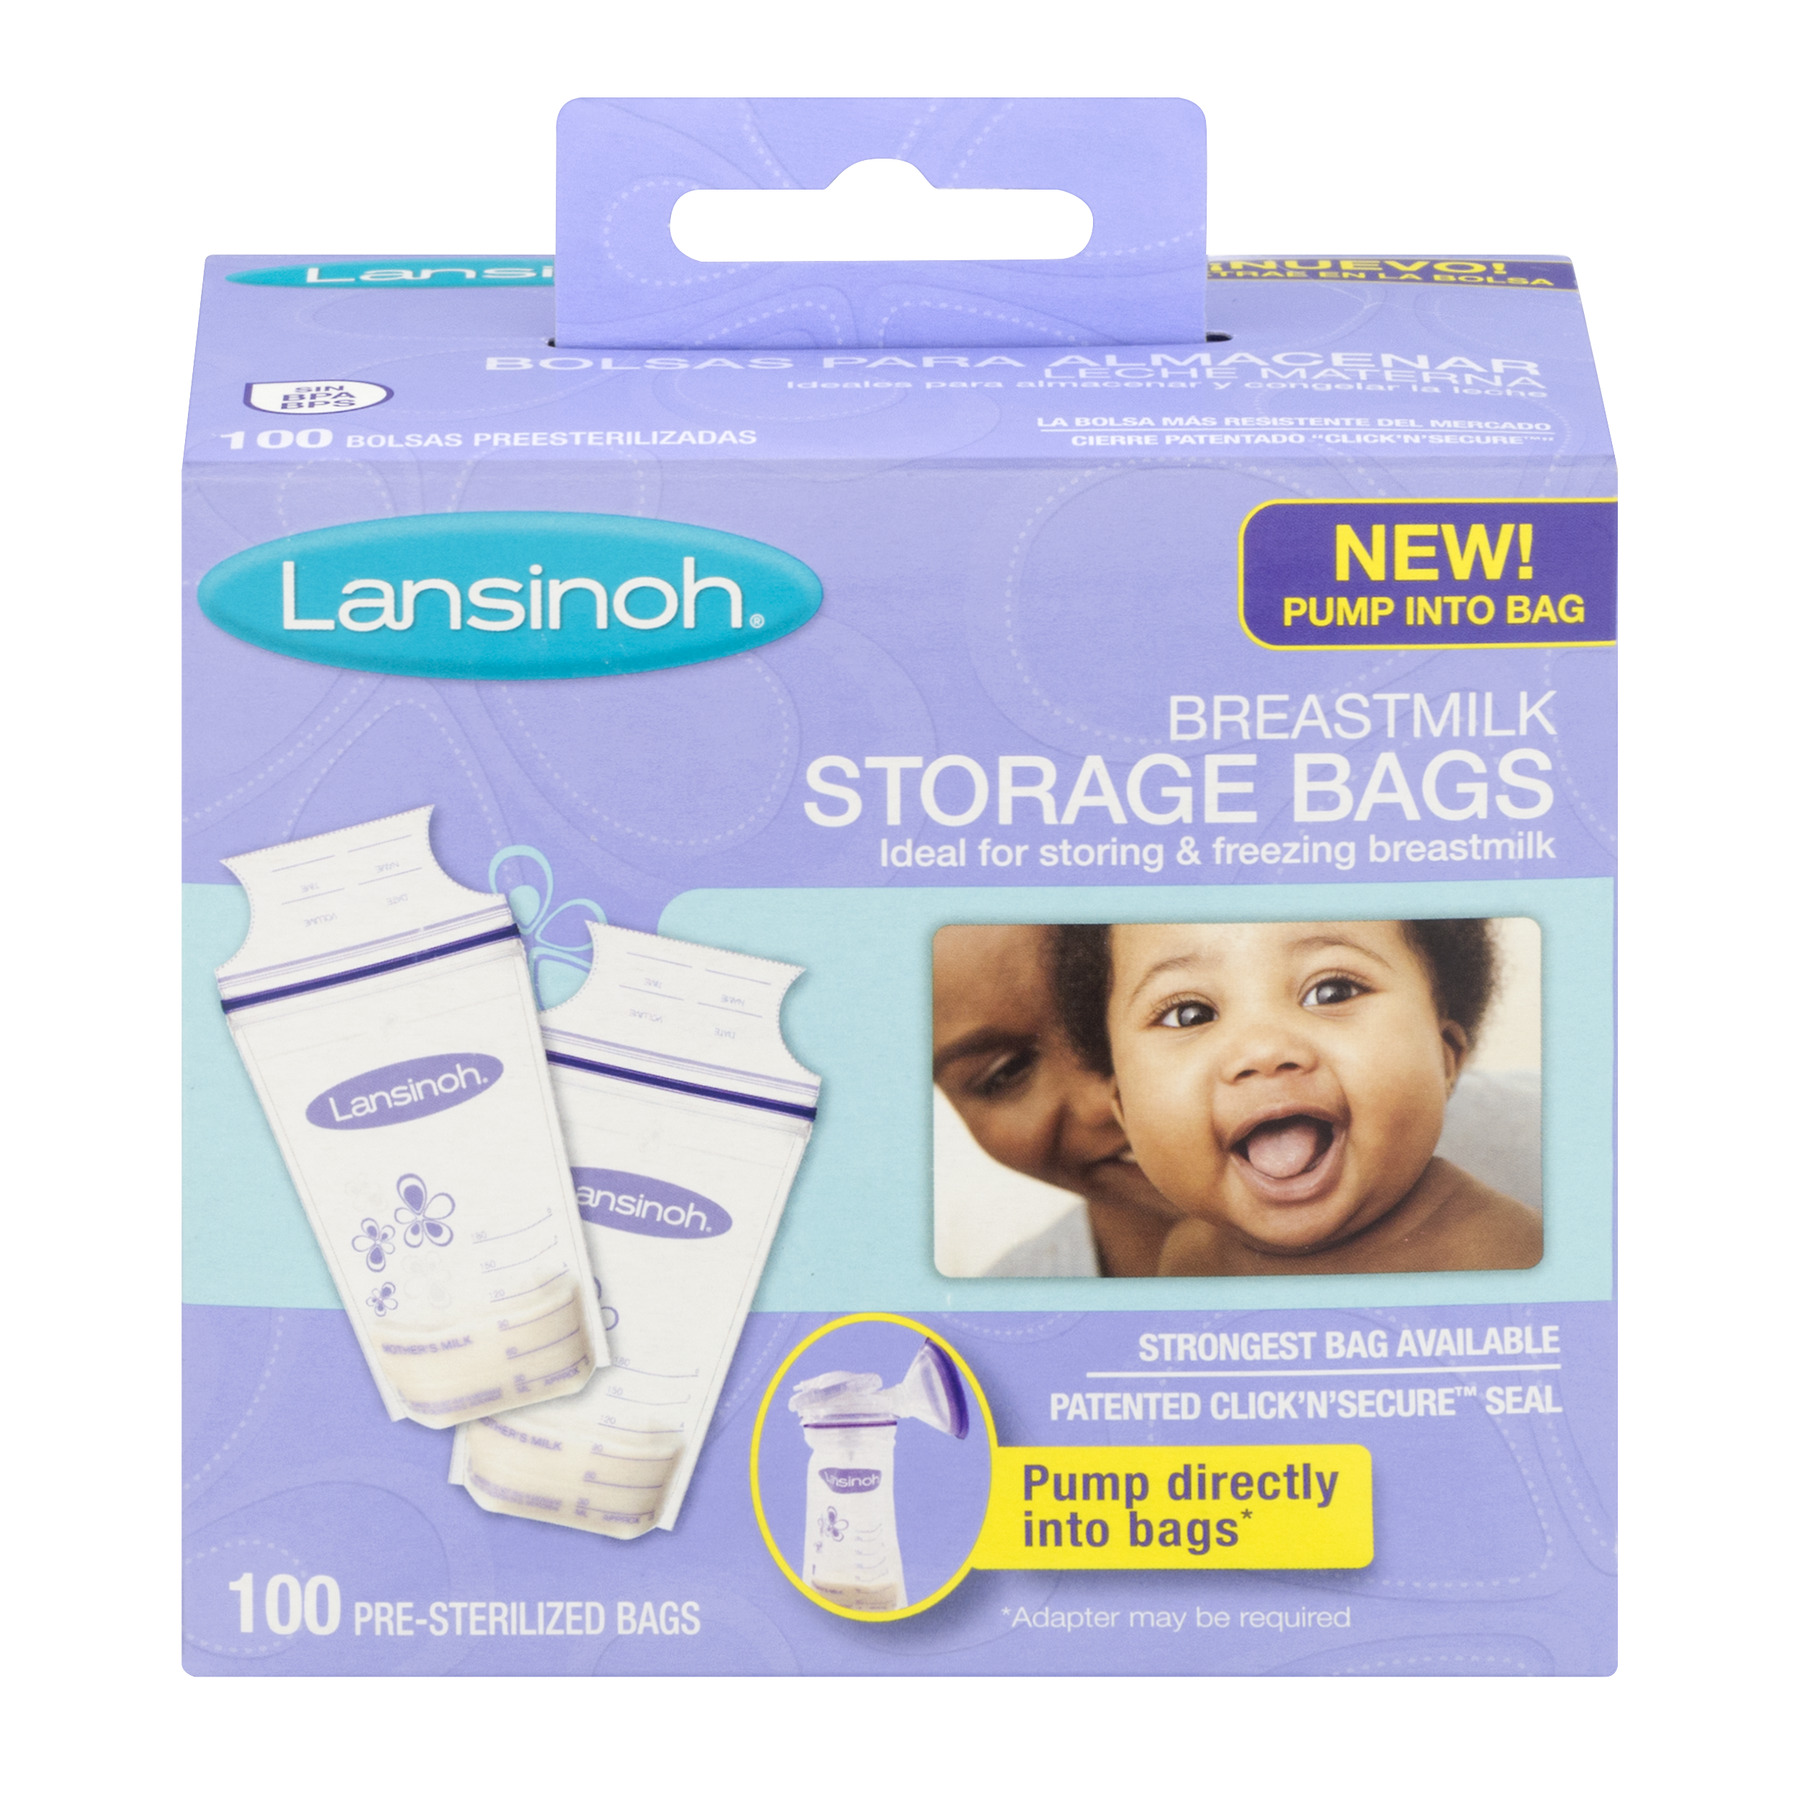 Lansinoh Breast Milk Storage Bags, 100 ct